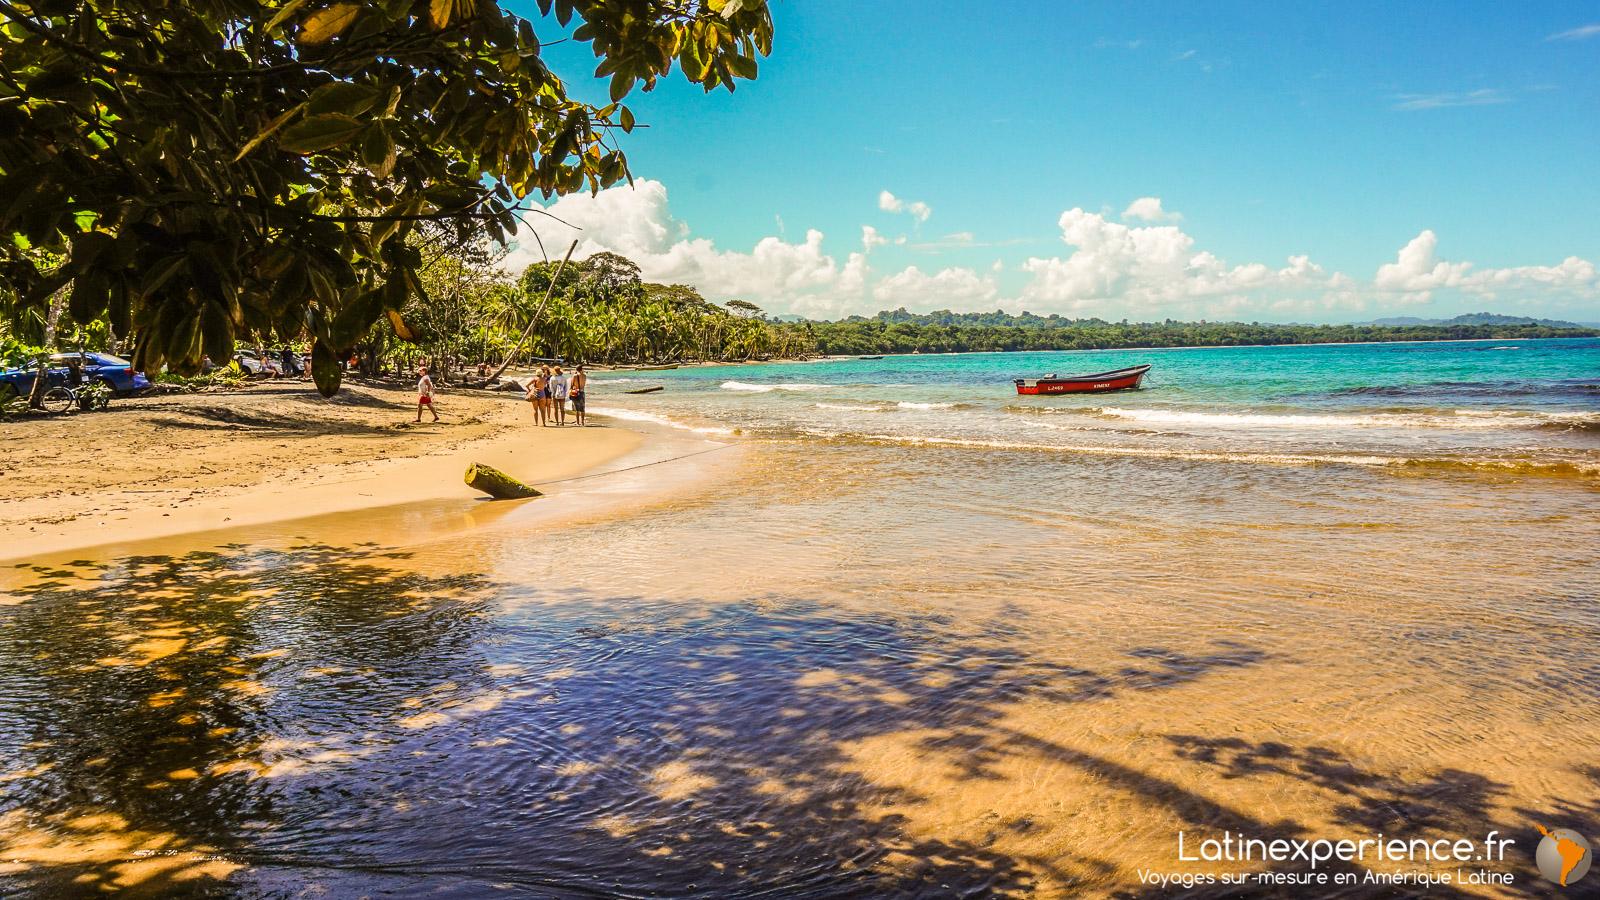 Costa Rica - Parc de Manzanillo - Latinexperience voyages